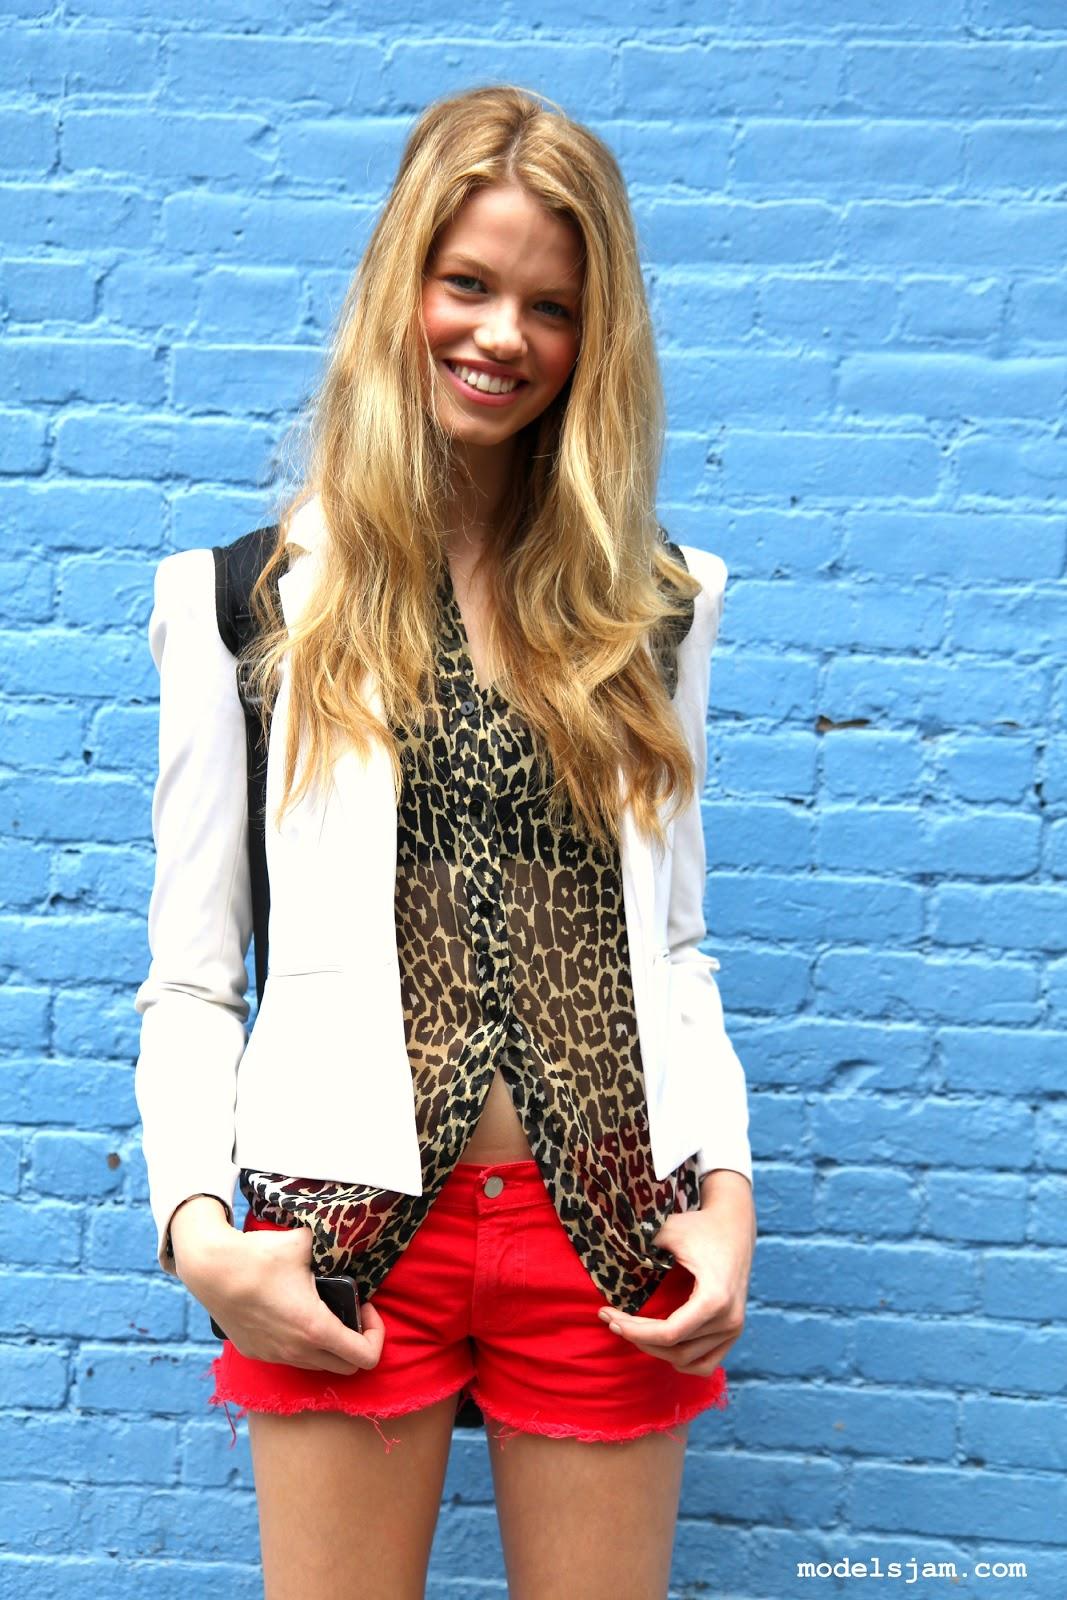 Models Jam Hailey Clauson After Dkny New York September